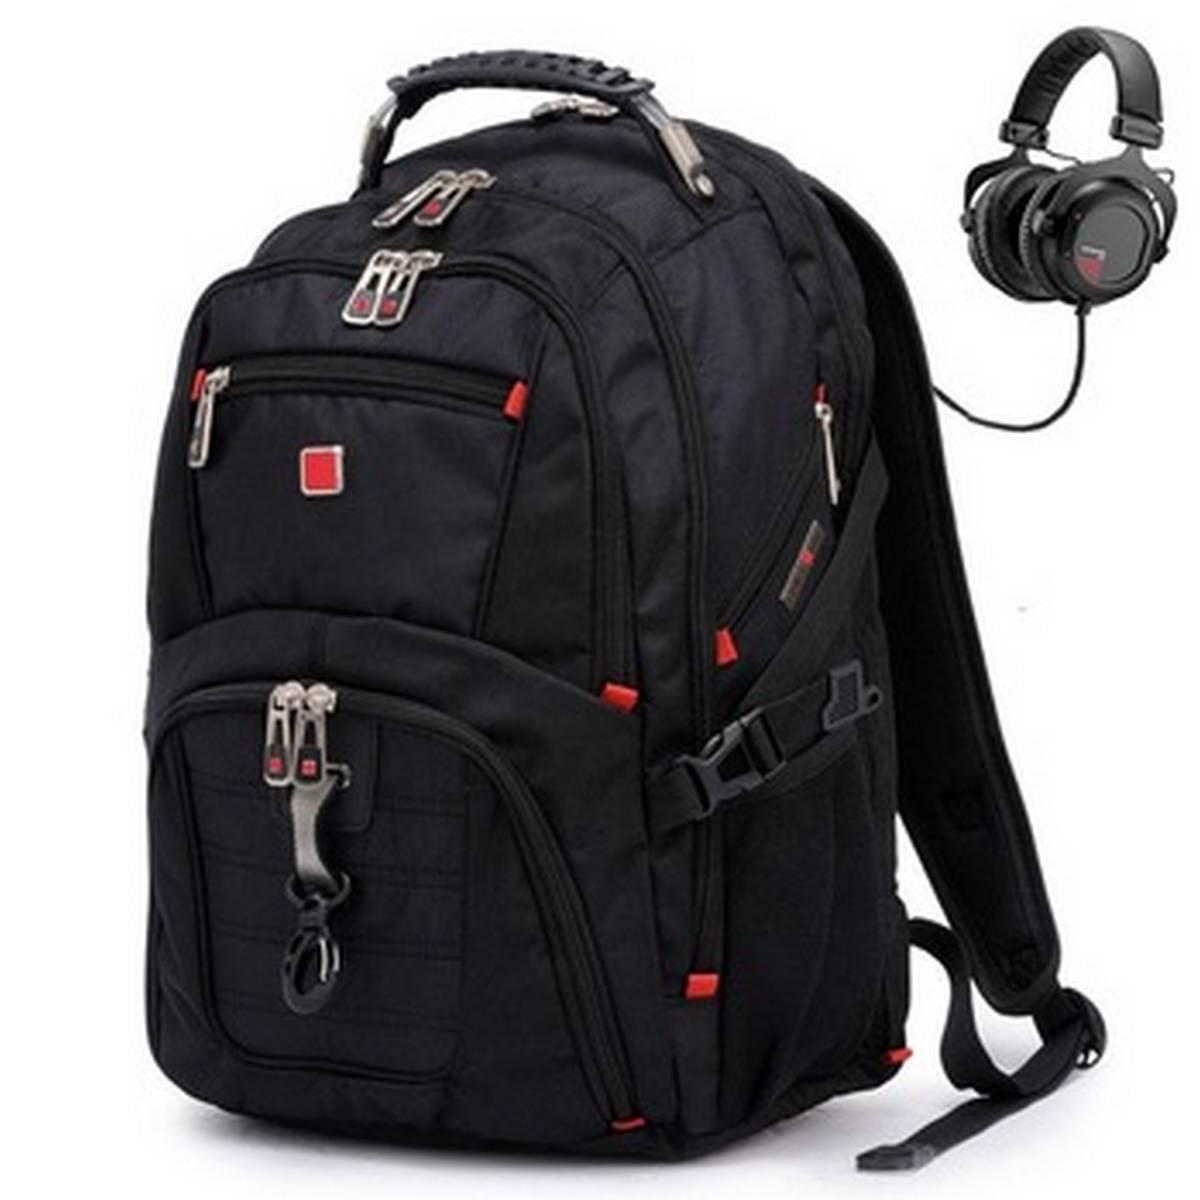 Men Backpack For School , College , Business , Laptop holder with USB Charging Port